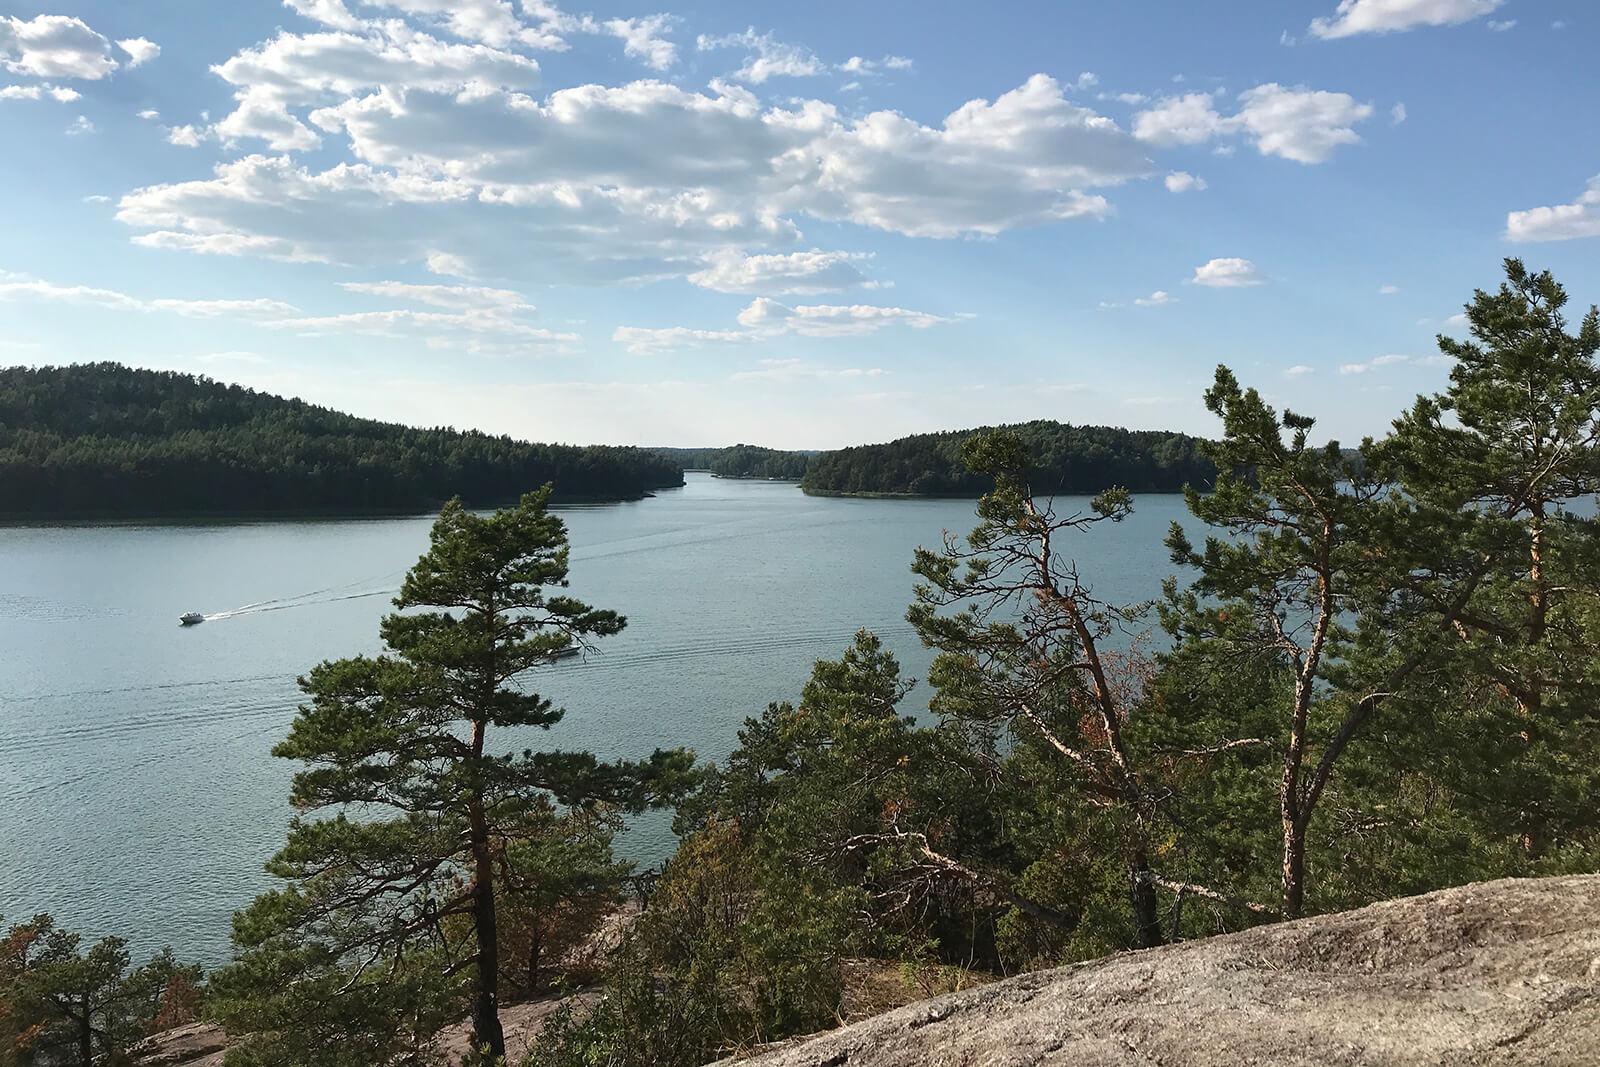 Turku arhicpelago_Pertti Immonen_DINOBlog